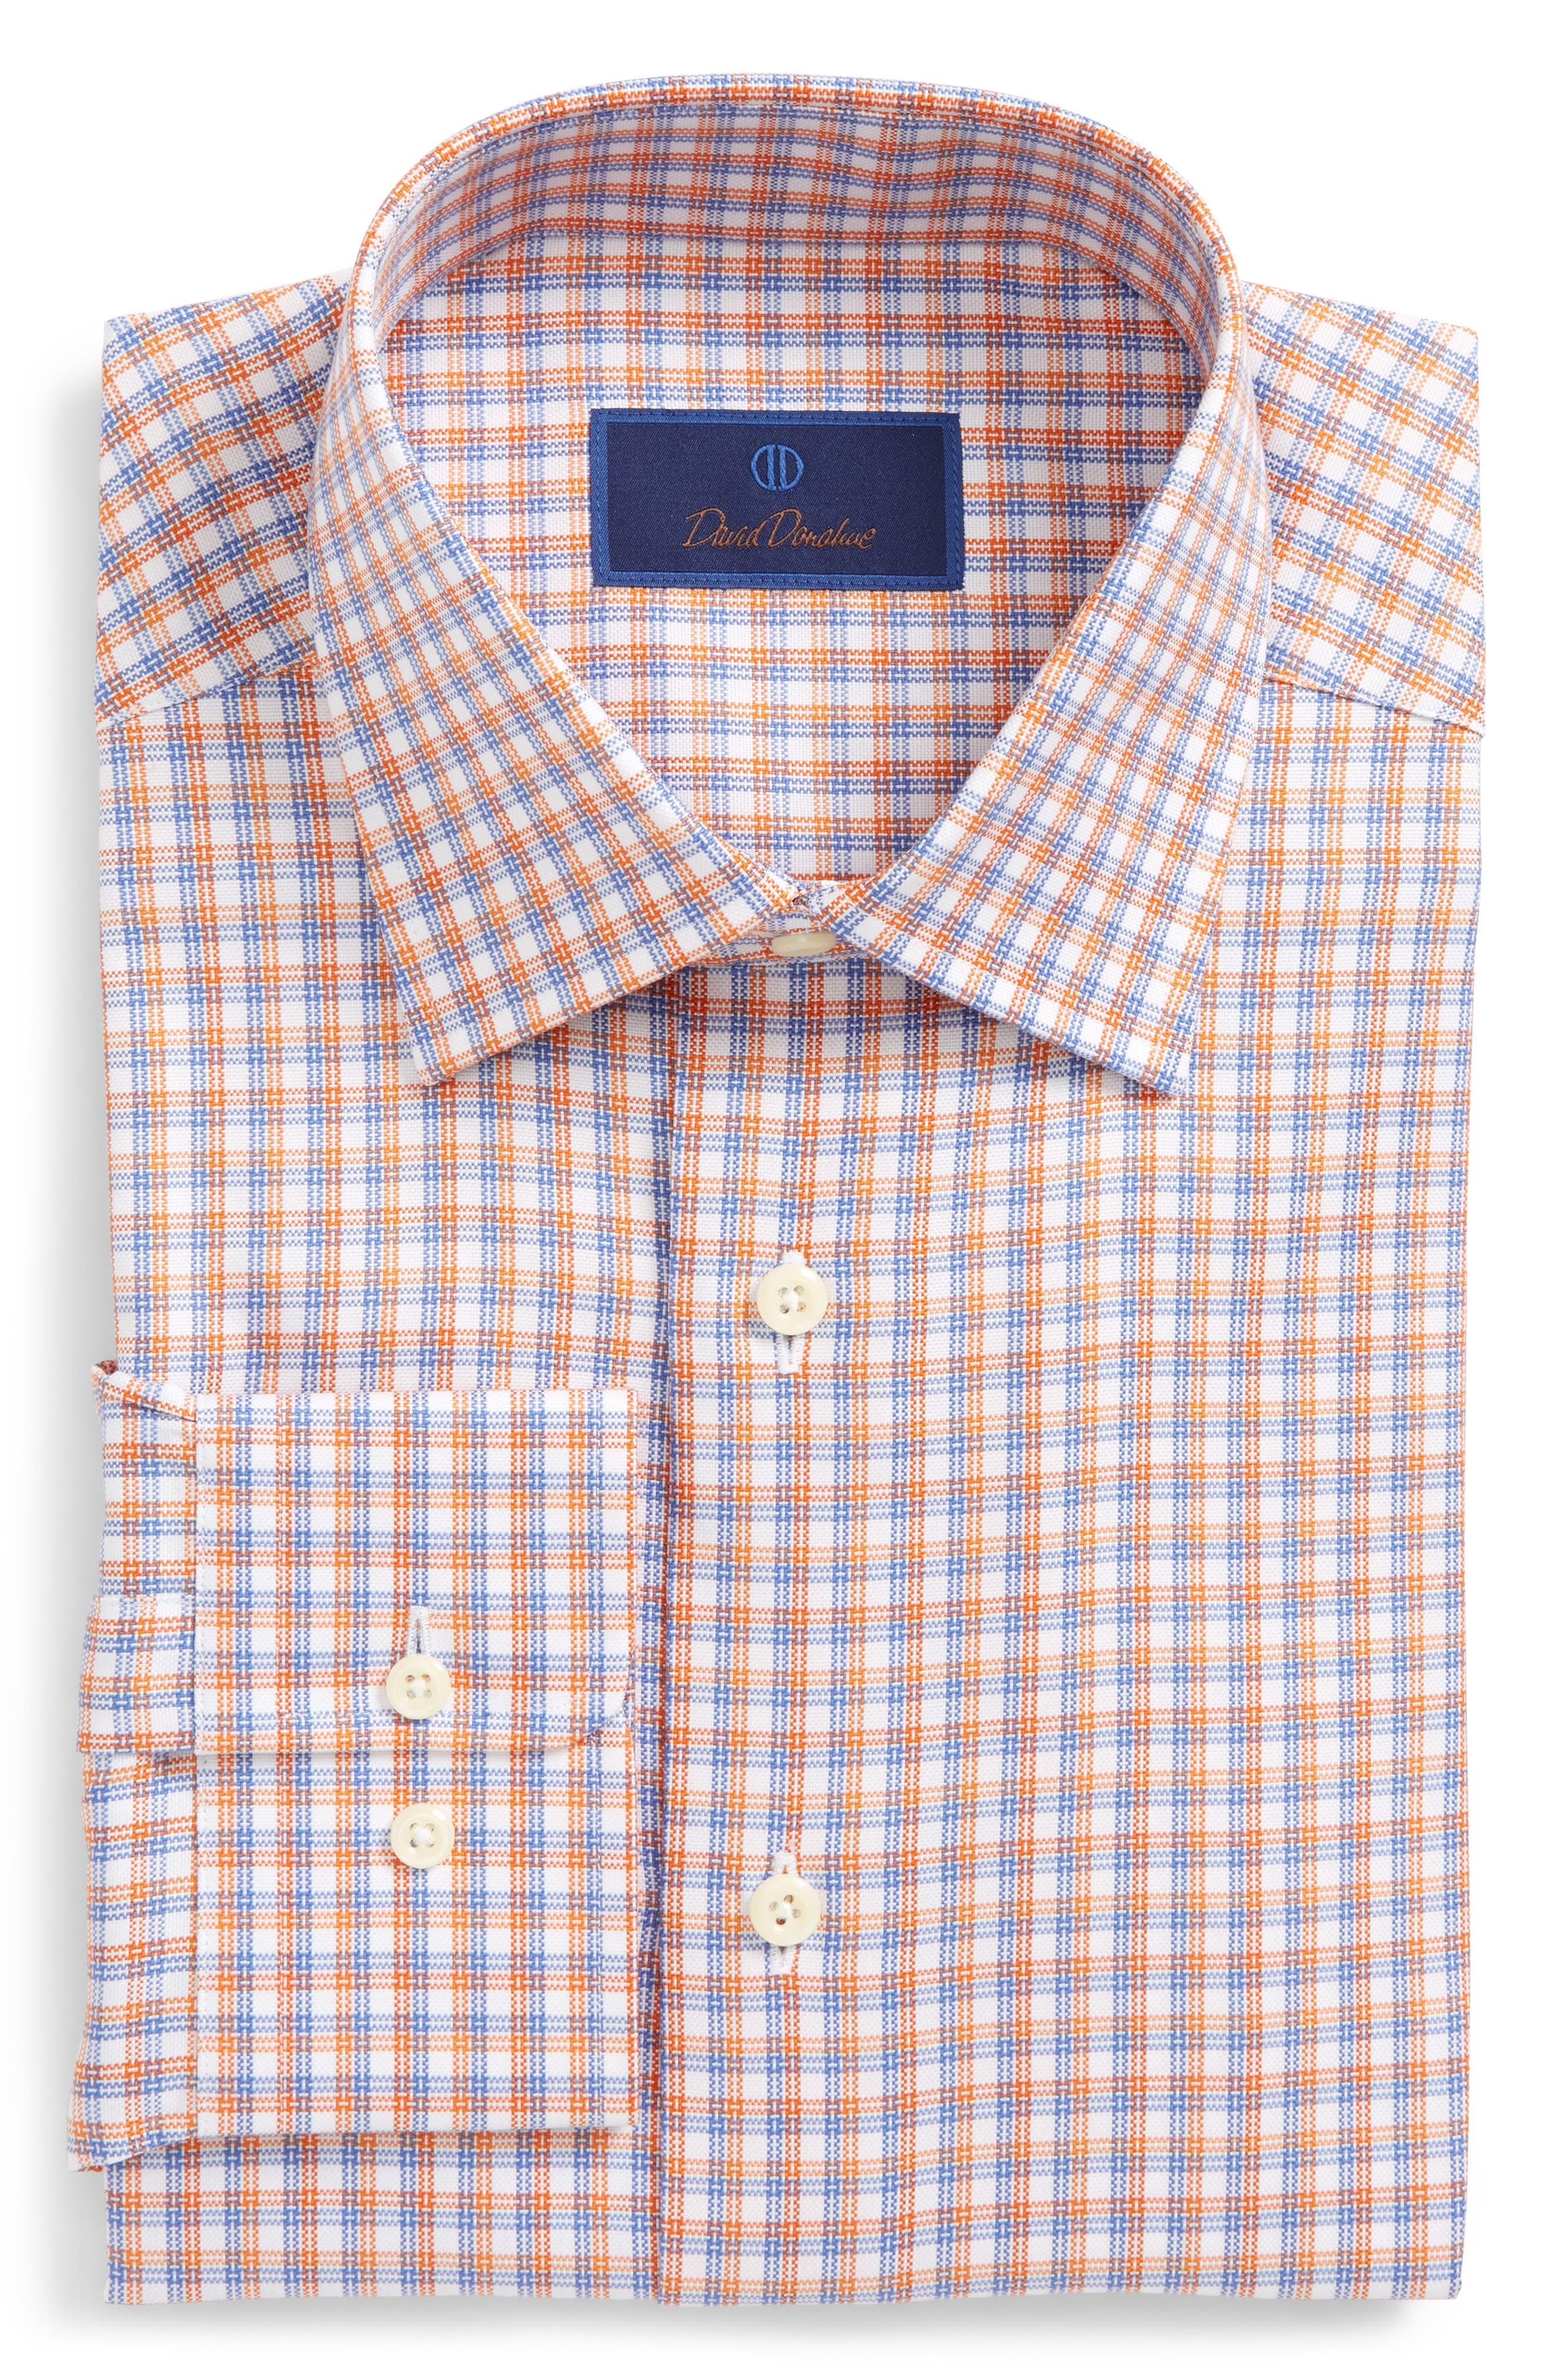 Regular Fit Plaid Dress Shirt,                             Main thumbnail 1, color,                             830